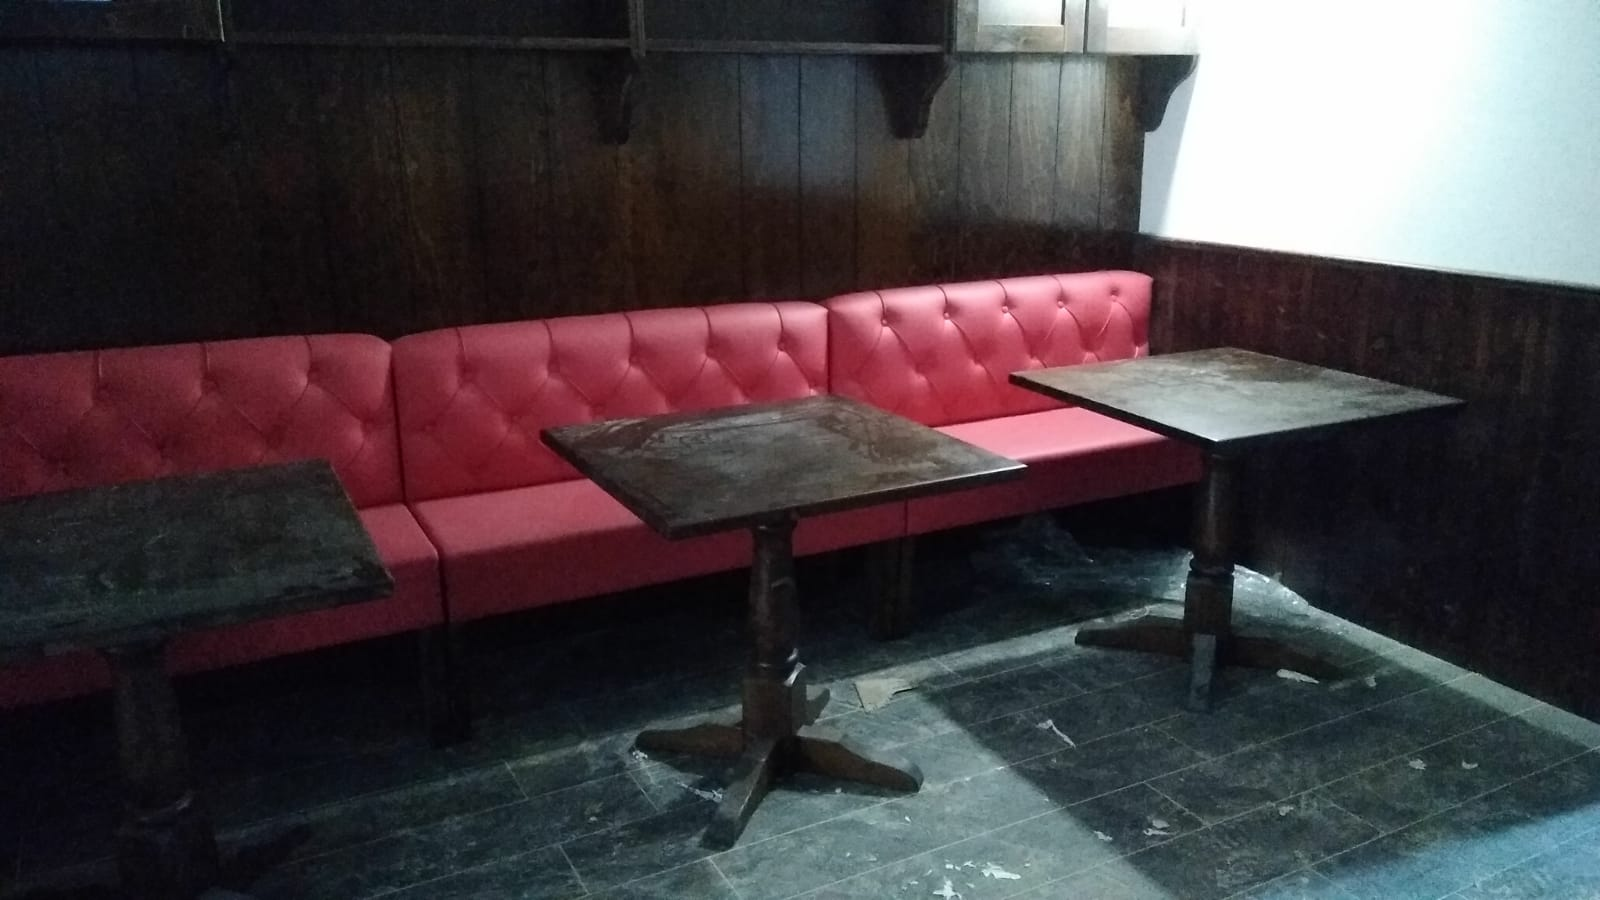 Tavoli E Panche Per Bar.Panche E Divanetti Imbottiti Per Pub Arredo Bar Lounge Bar Bar